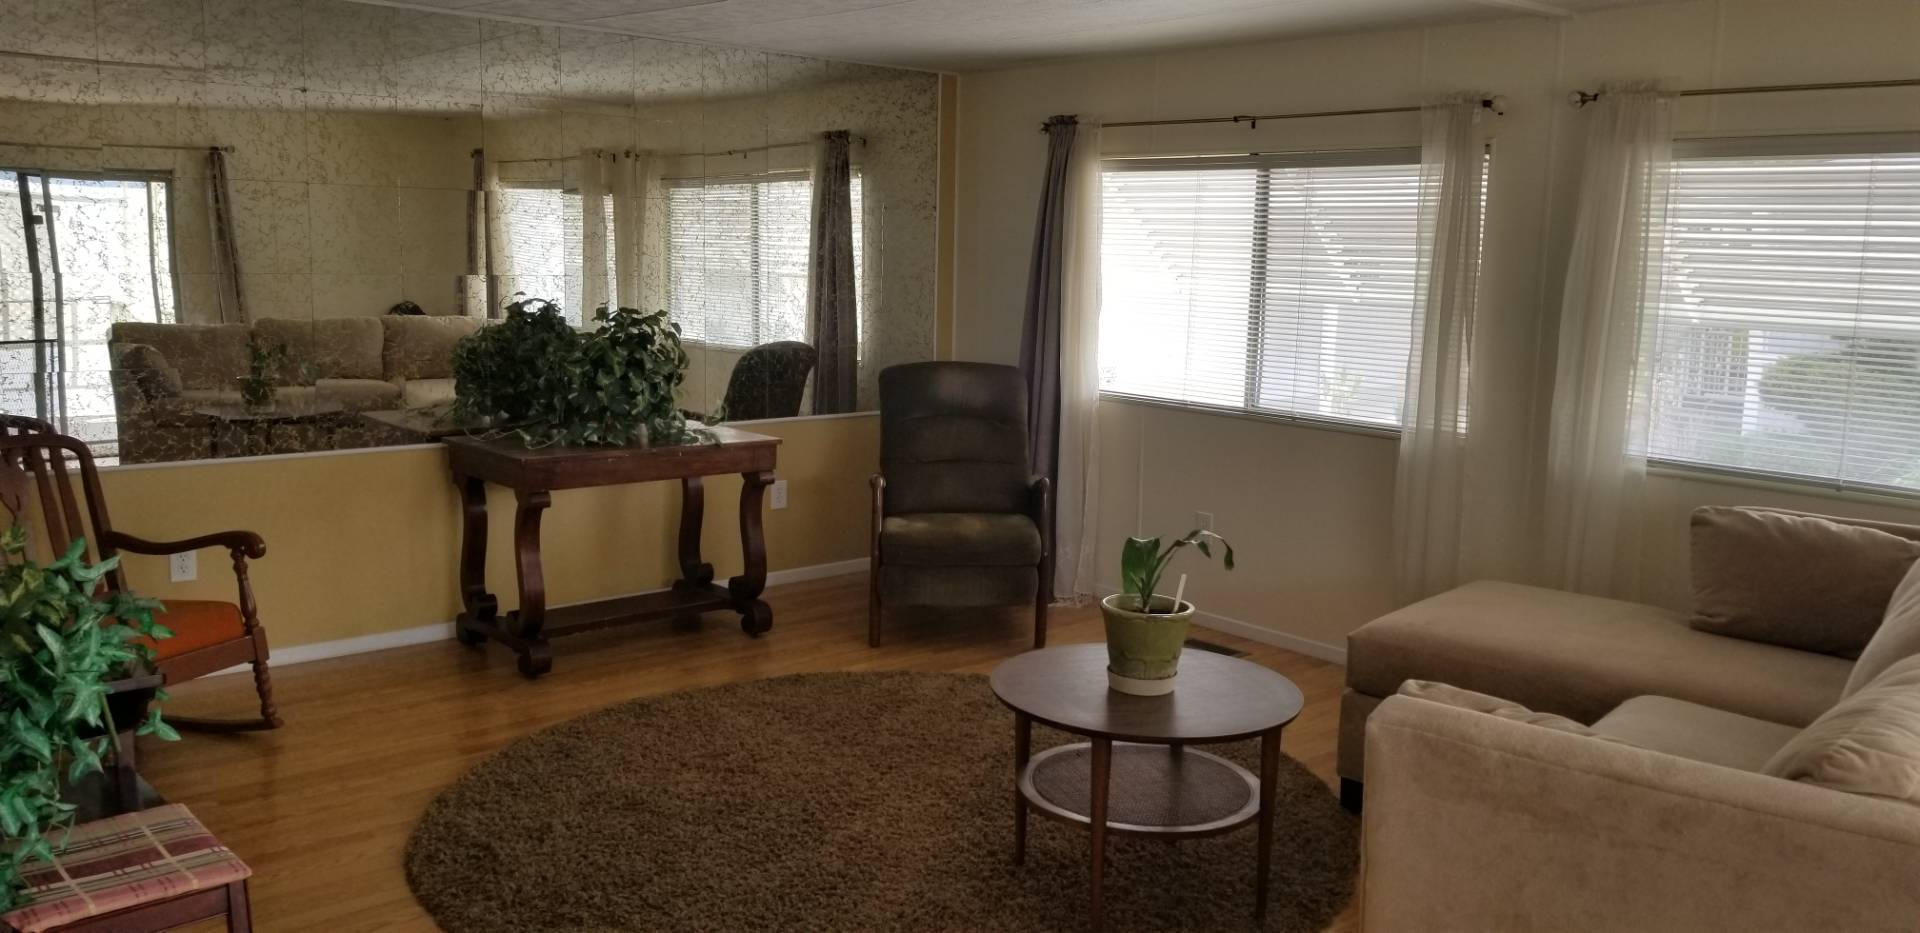 12531 Blue Spruce Ave, Garden Grove, CA 92840   RealEstate.com